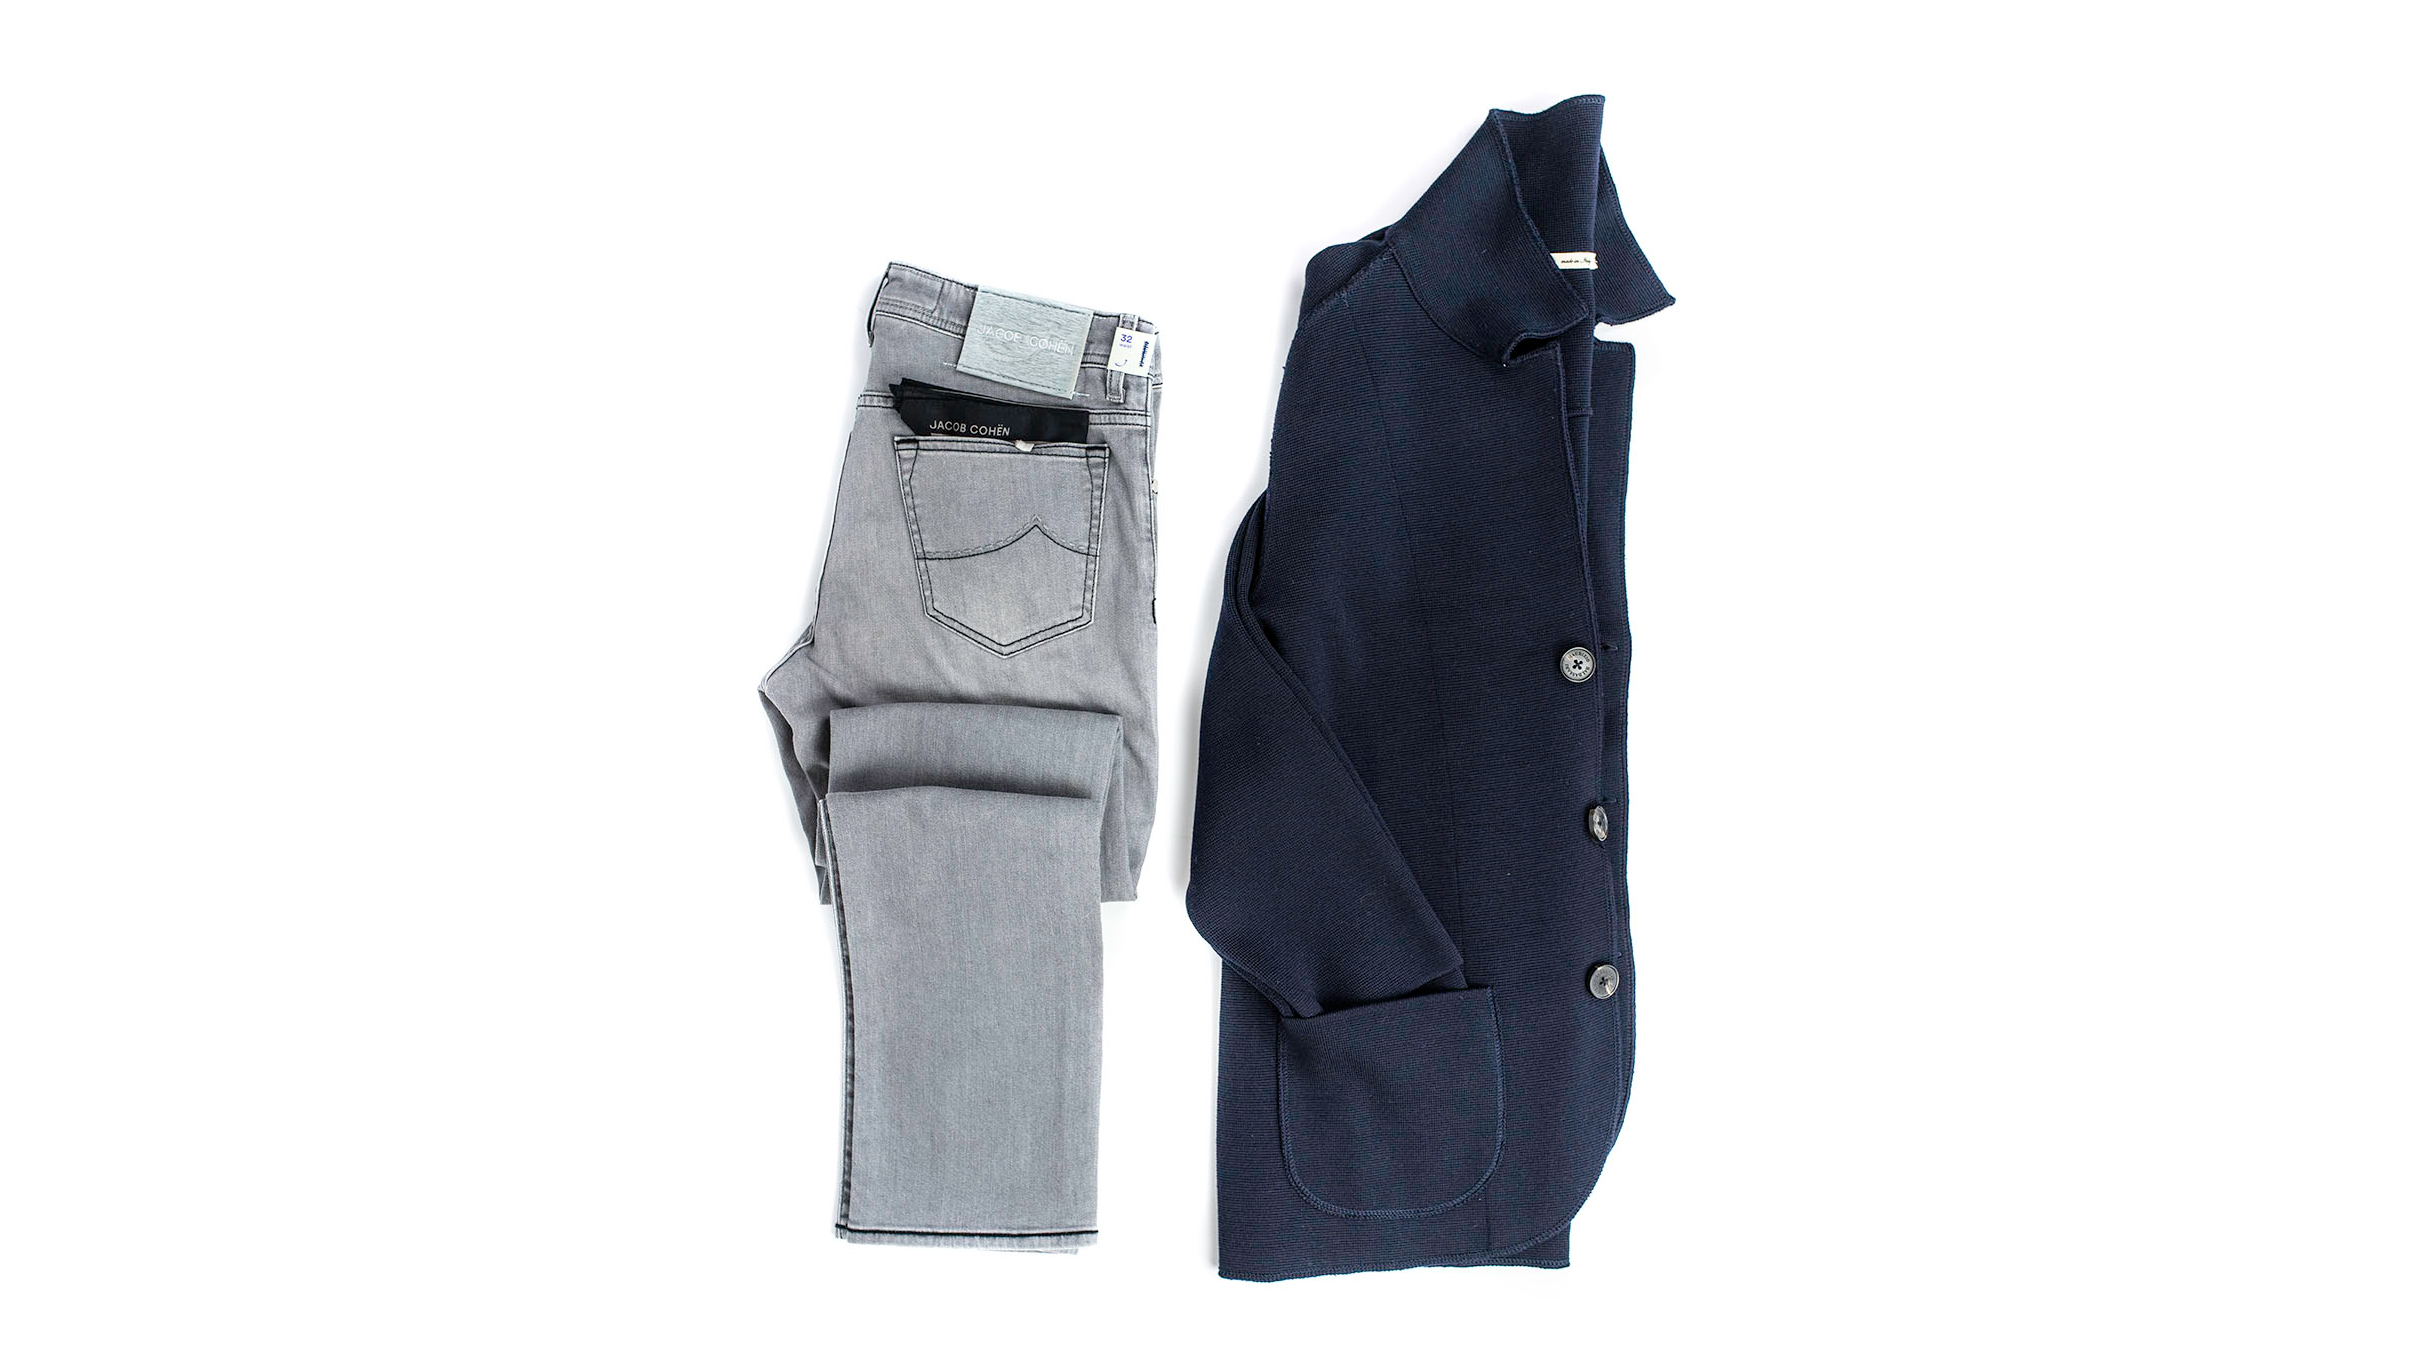 The seasonless jacket